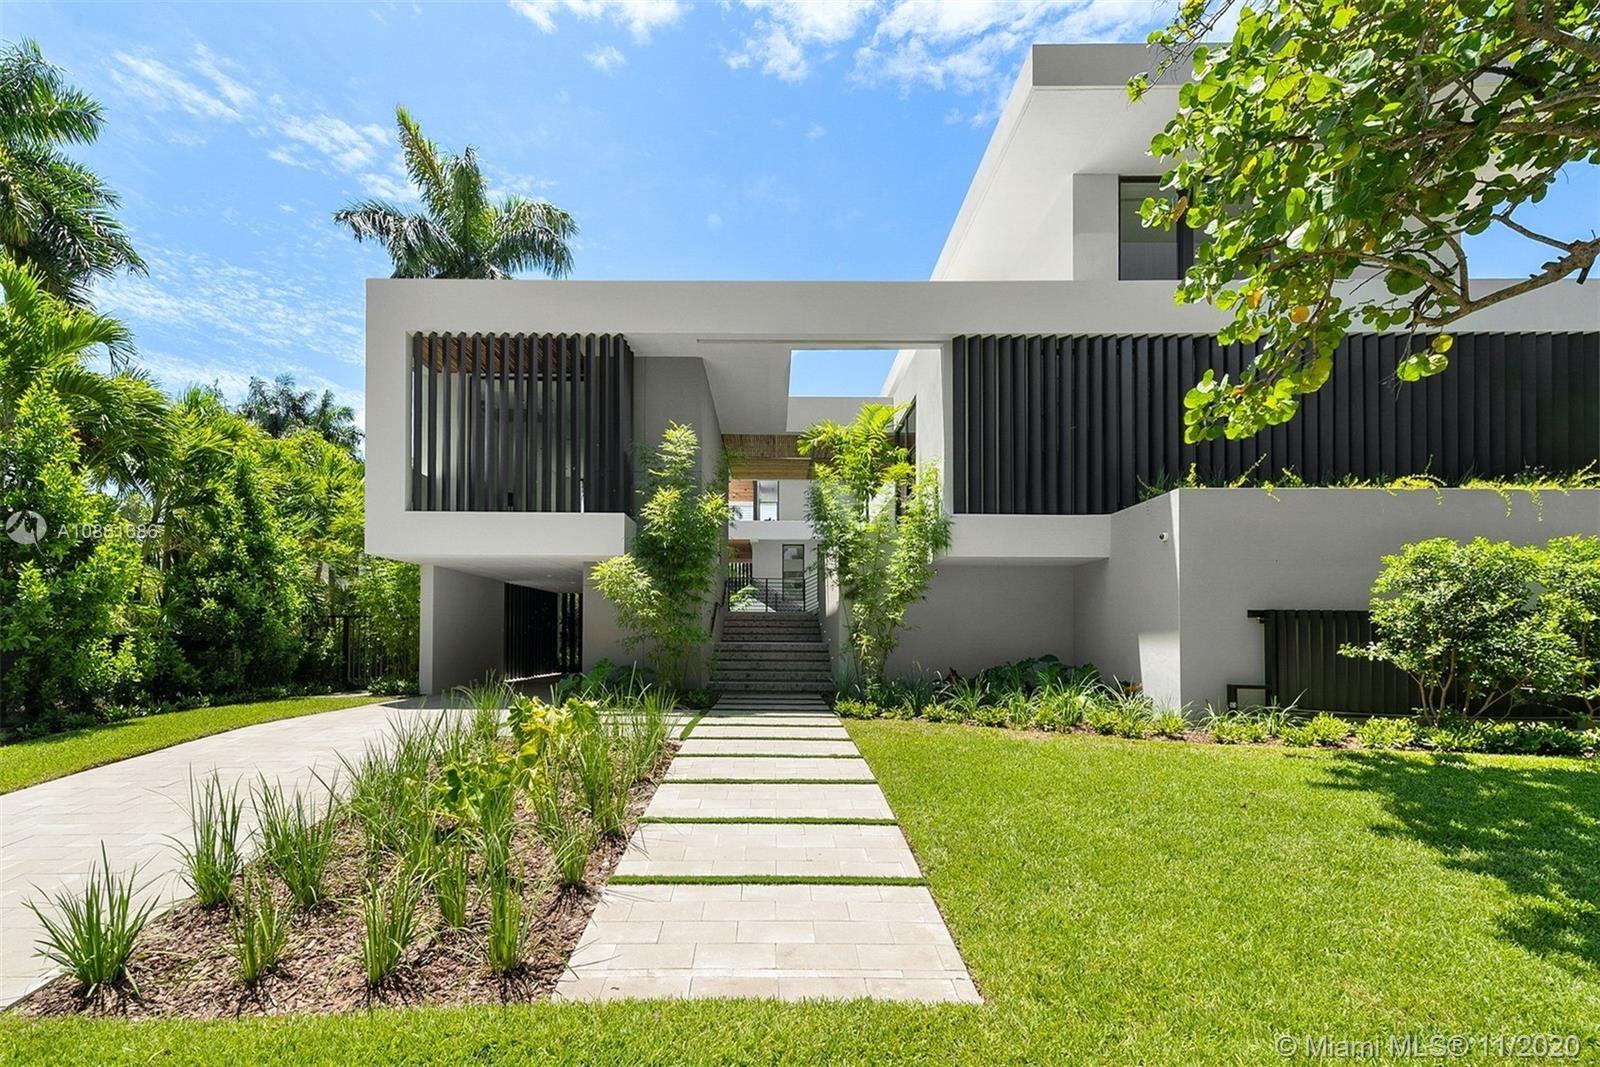 3608 Stewart Ave, Miami, FL 33133 - #: A10861686